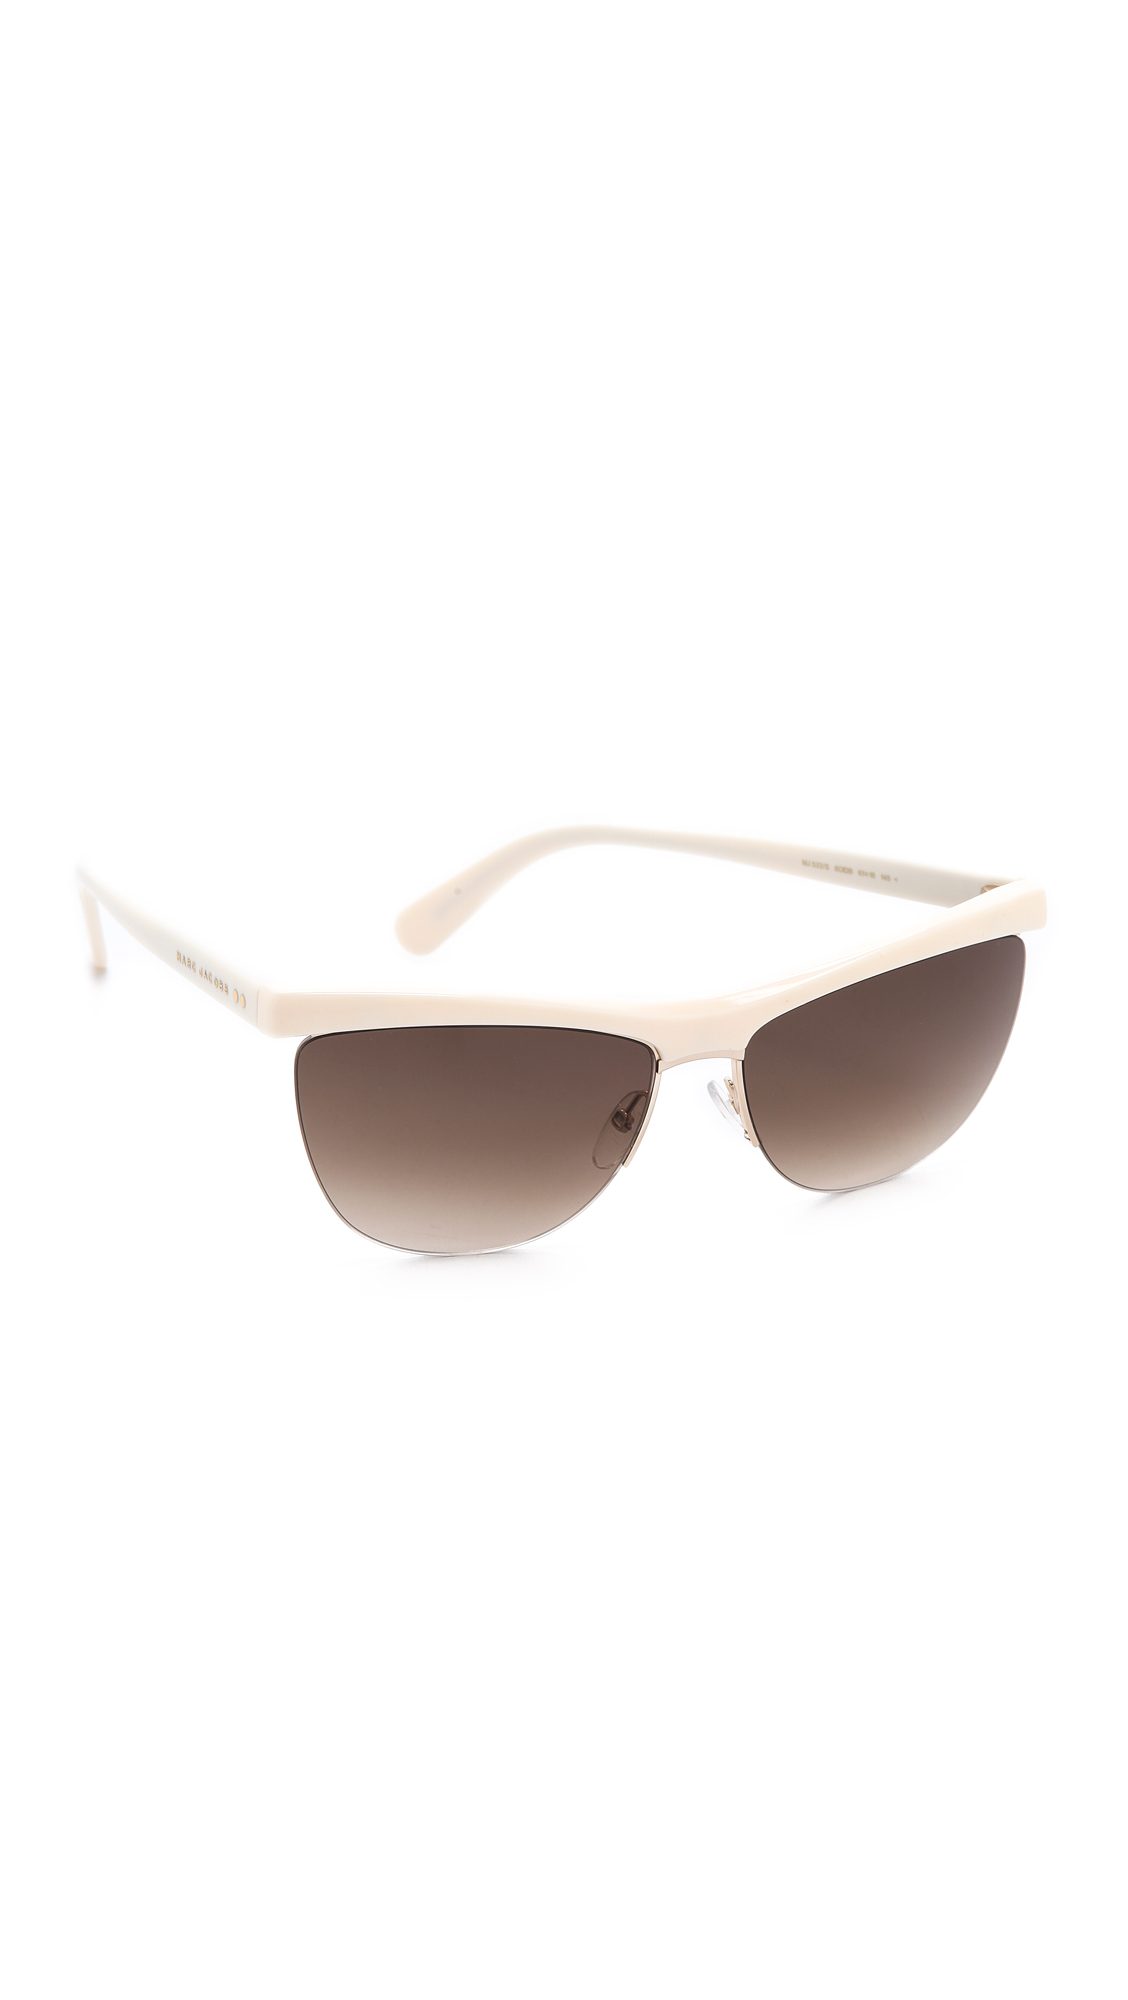 Marc Jacobs Rimless Bottom Sunglasses - Gold/Brown Gradient in Metallic